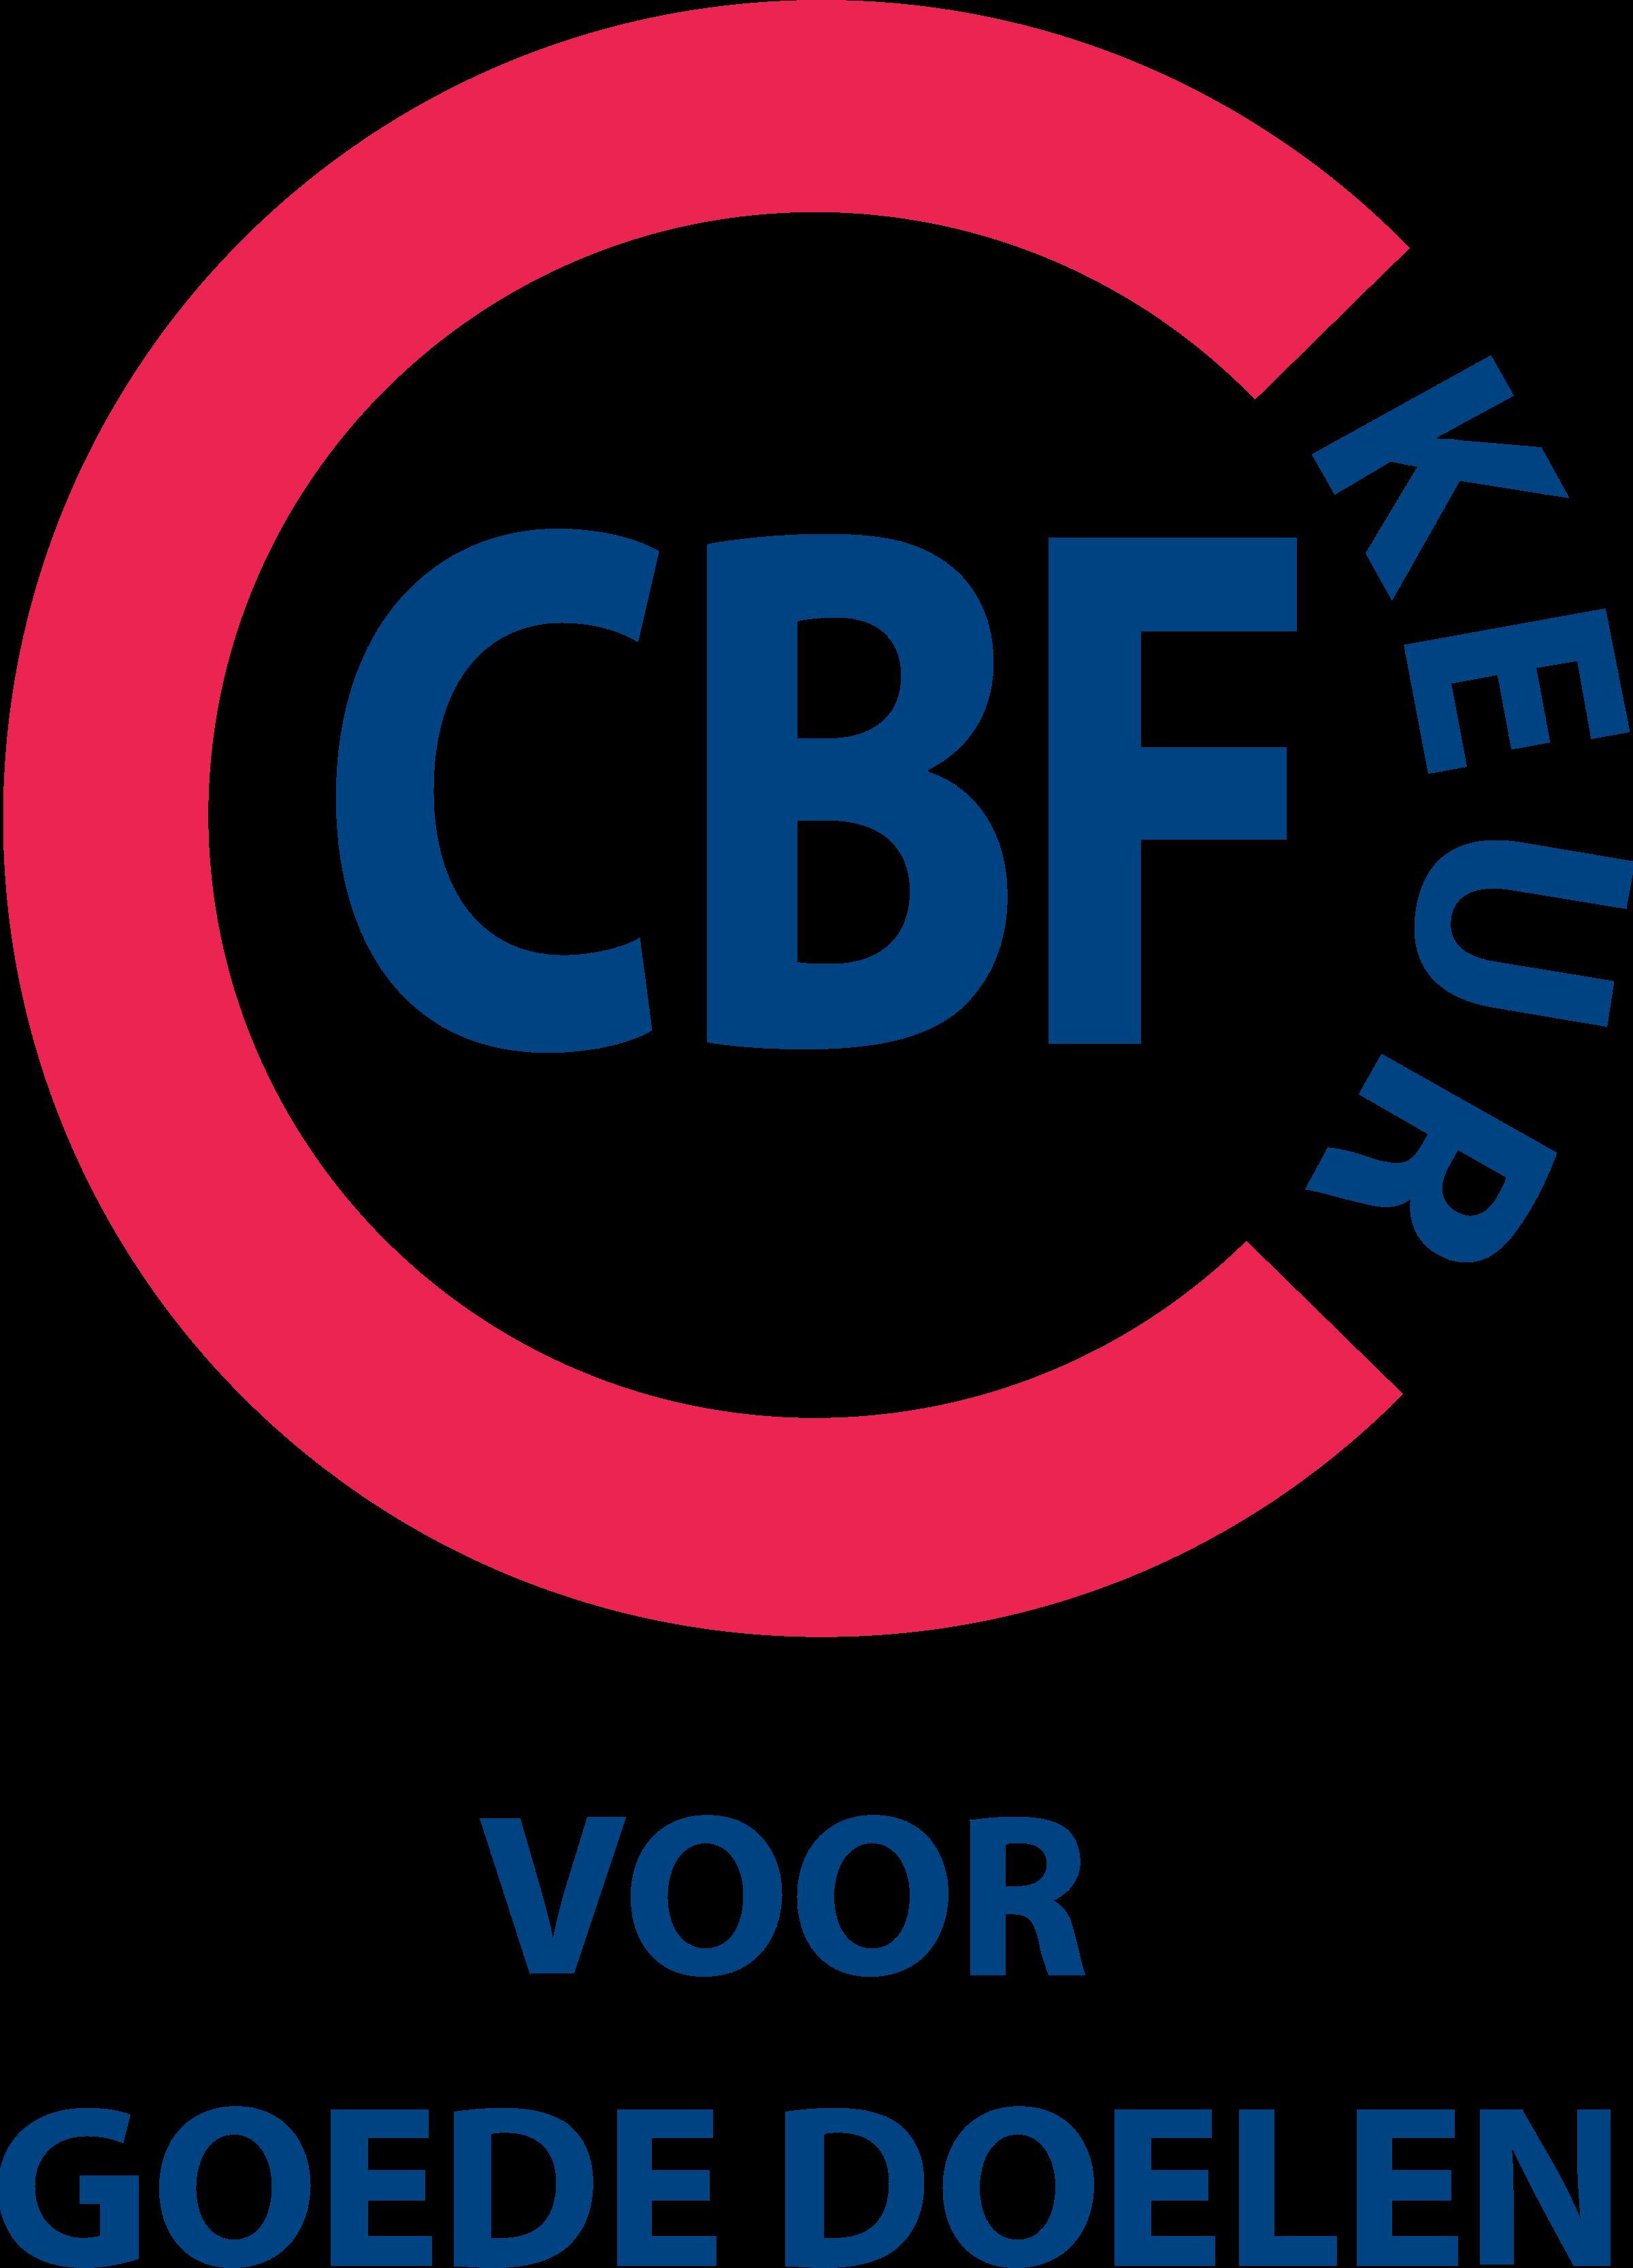 CBF Logo PNG Transparent & SVG Vector.